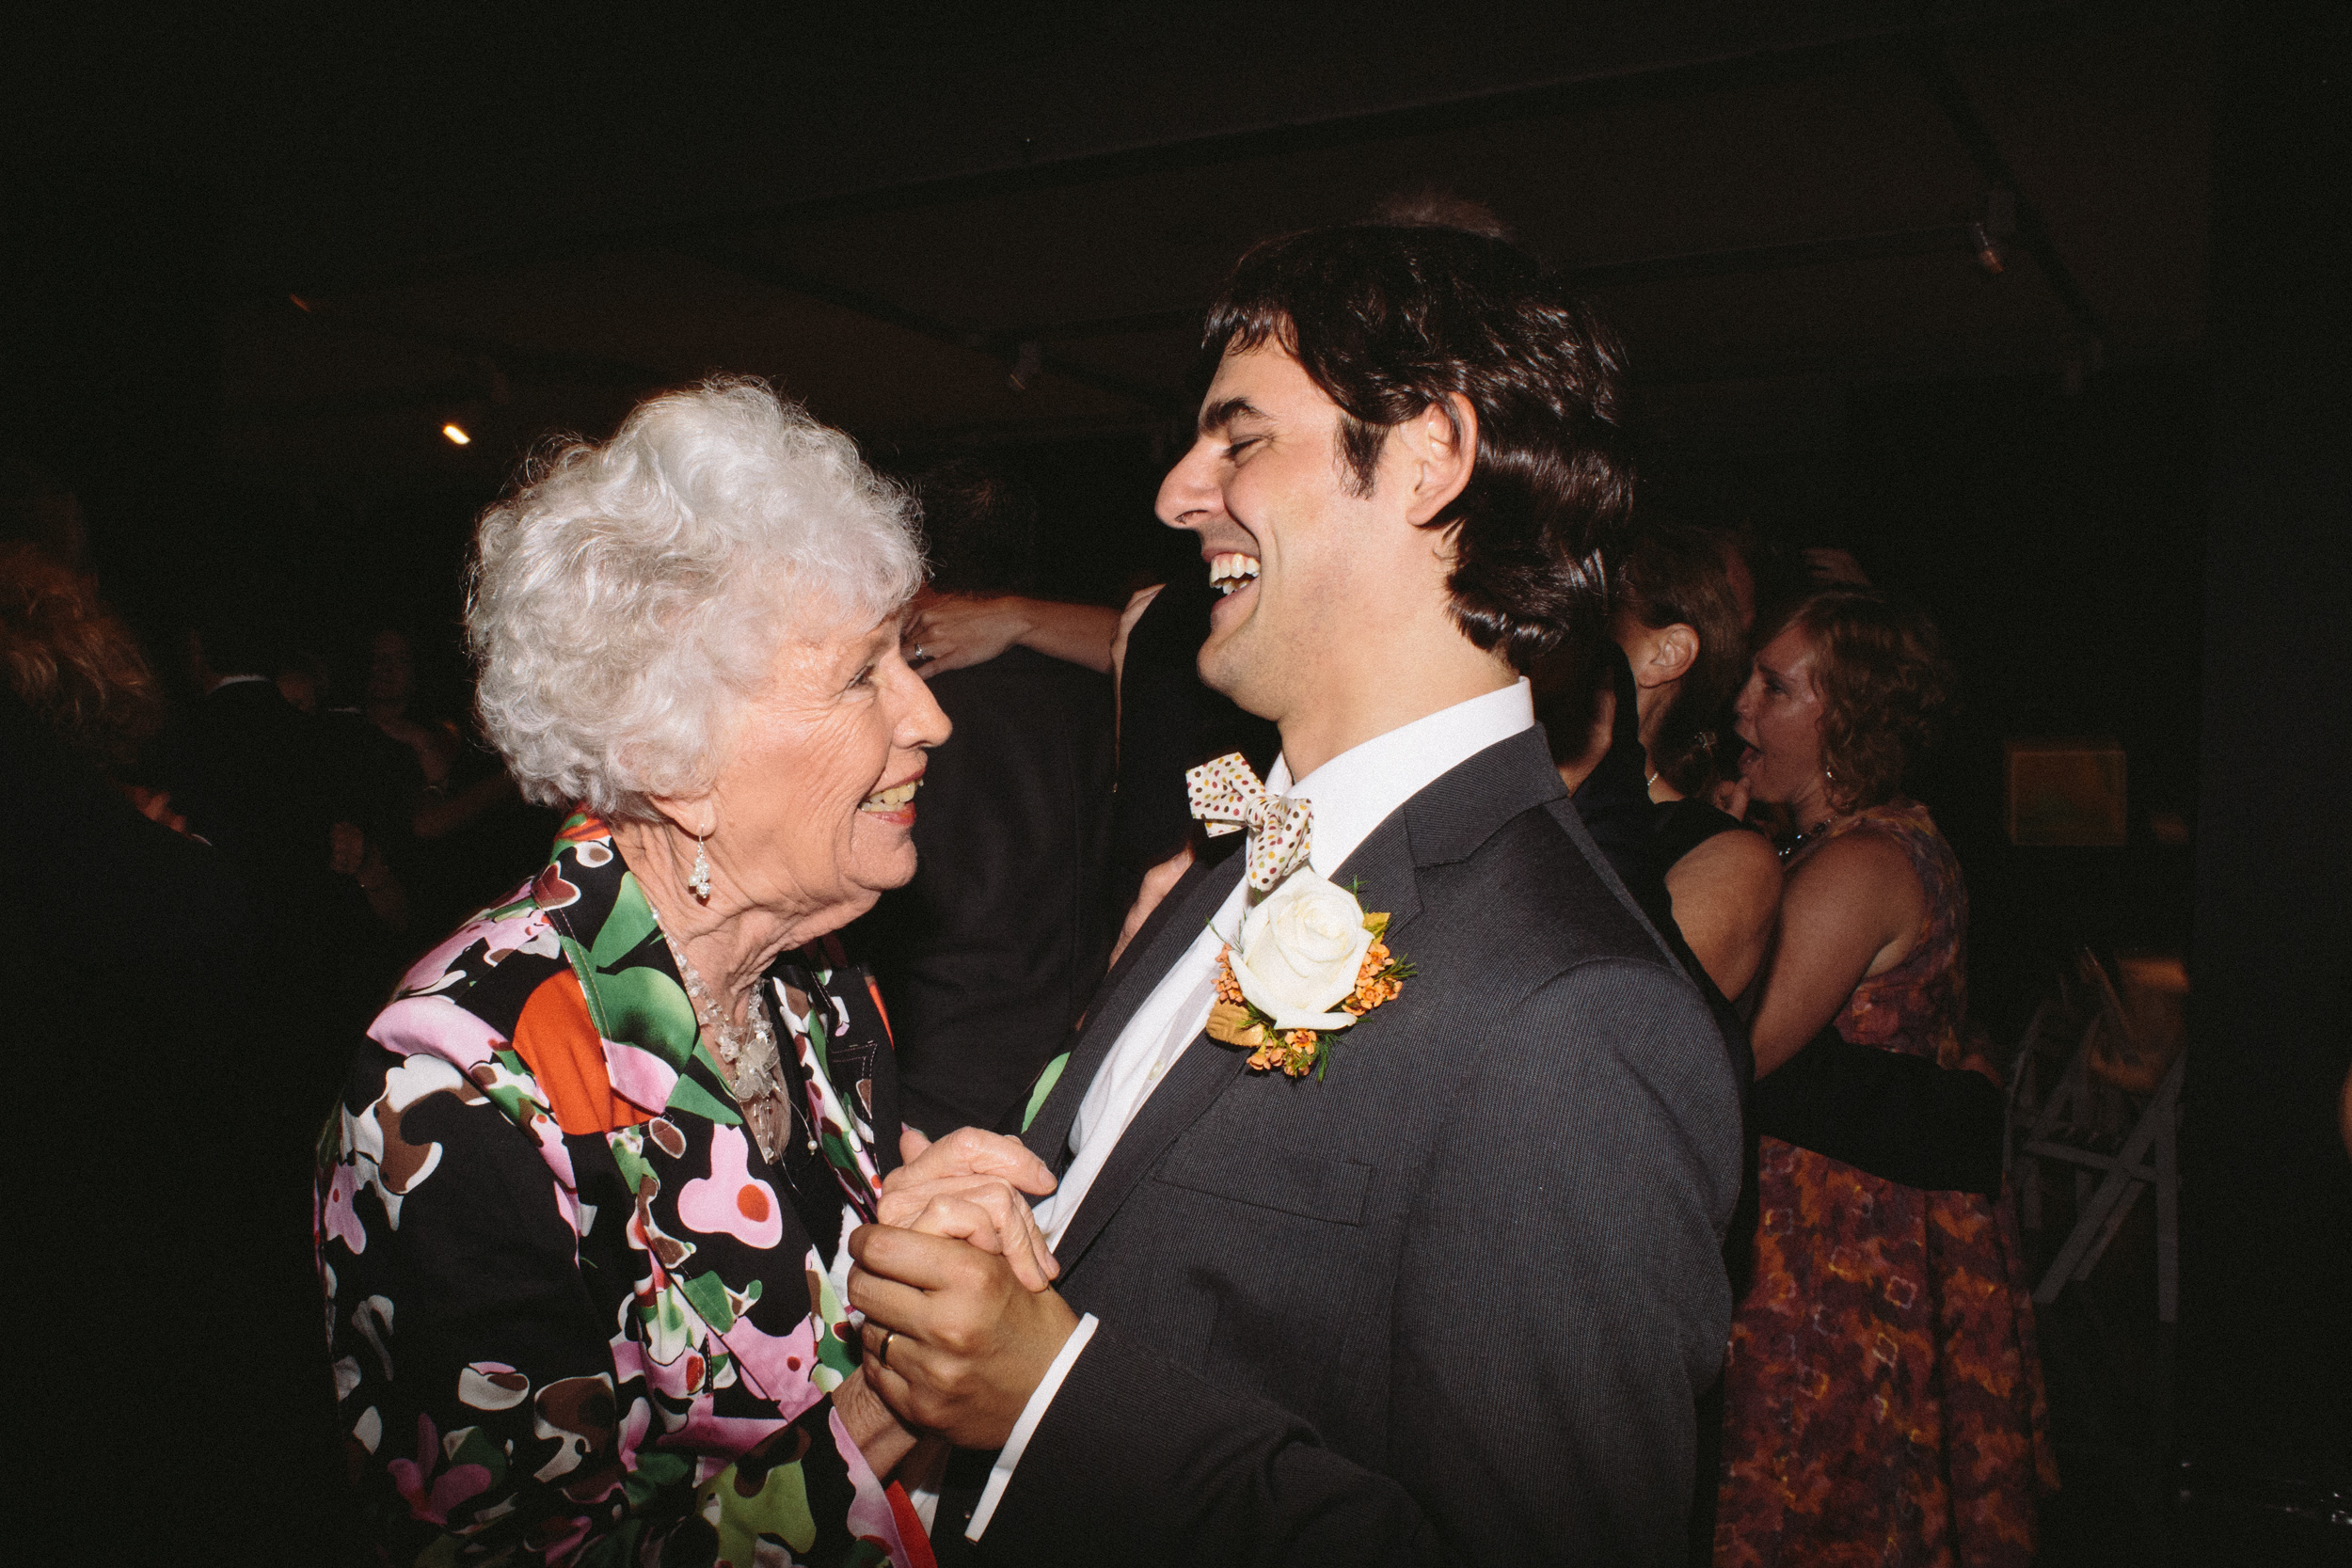 10-05-2013 maggie & adam wedding photography by brian milo-169.jpg